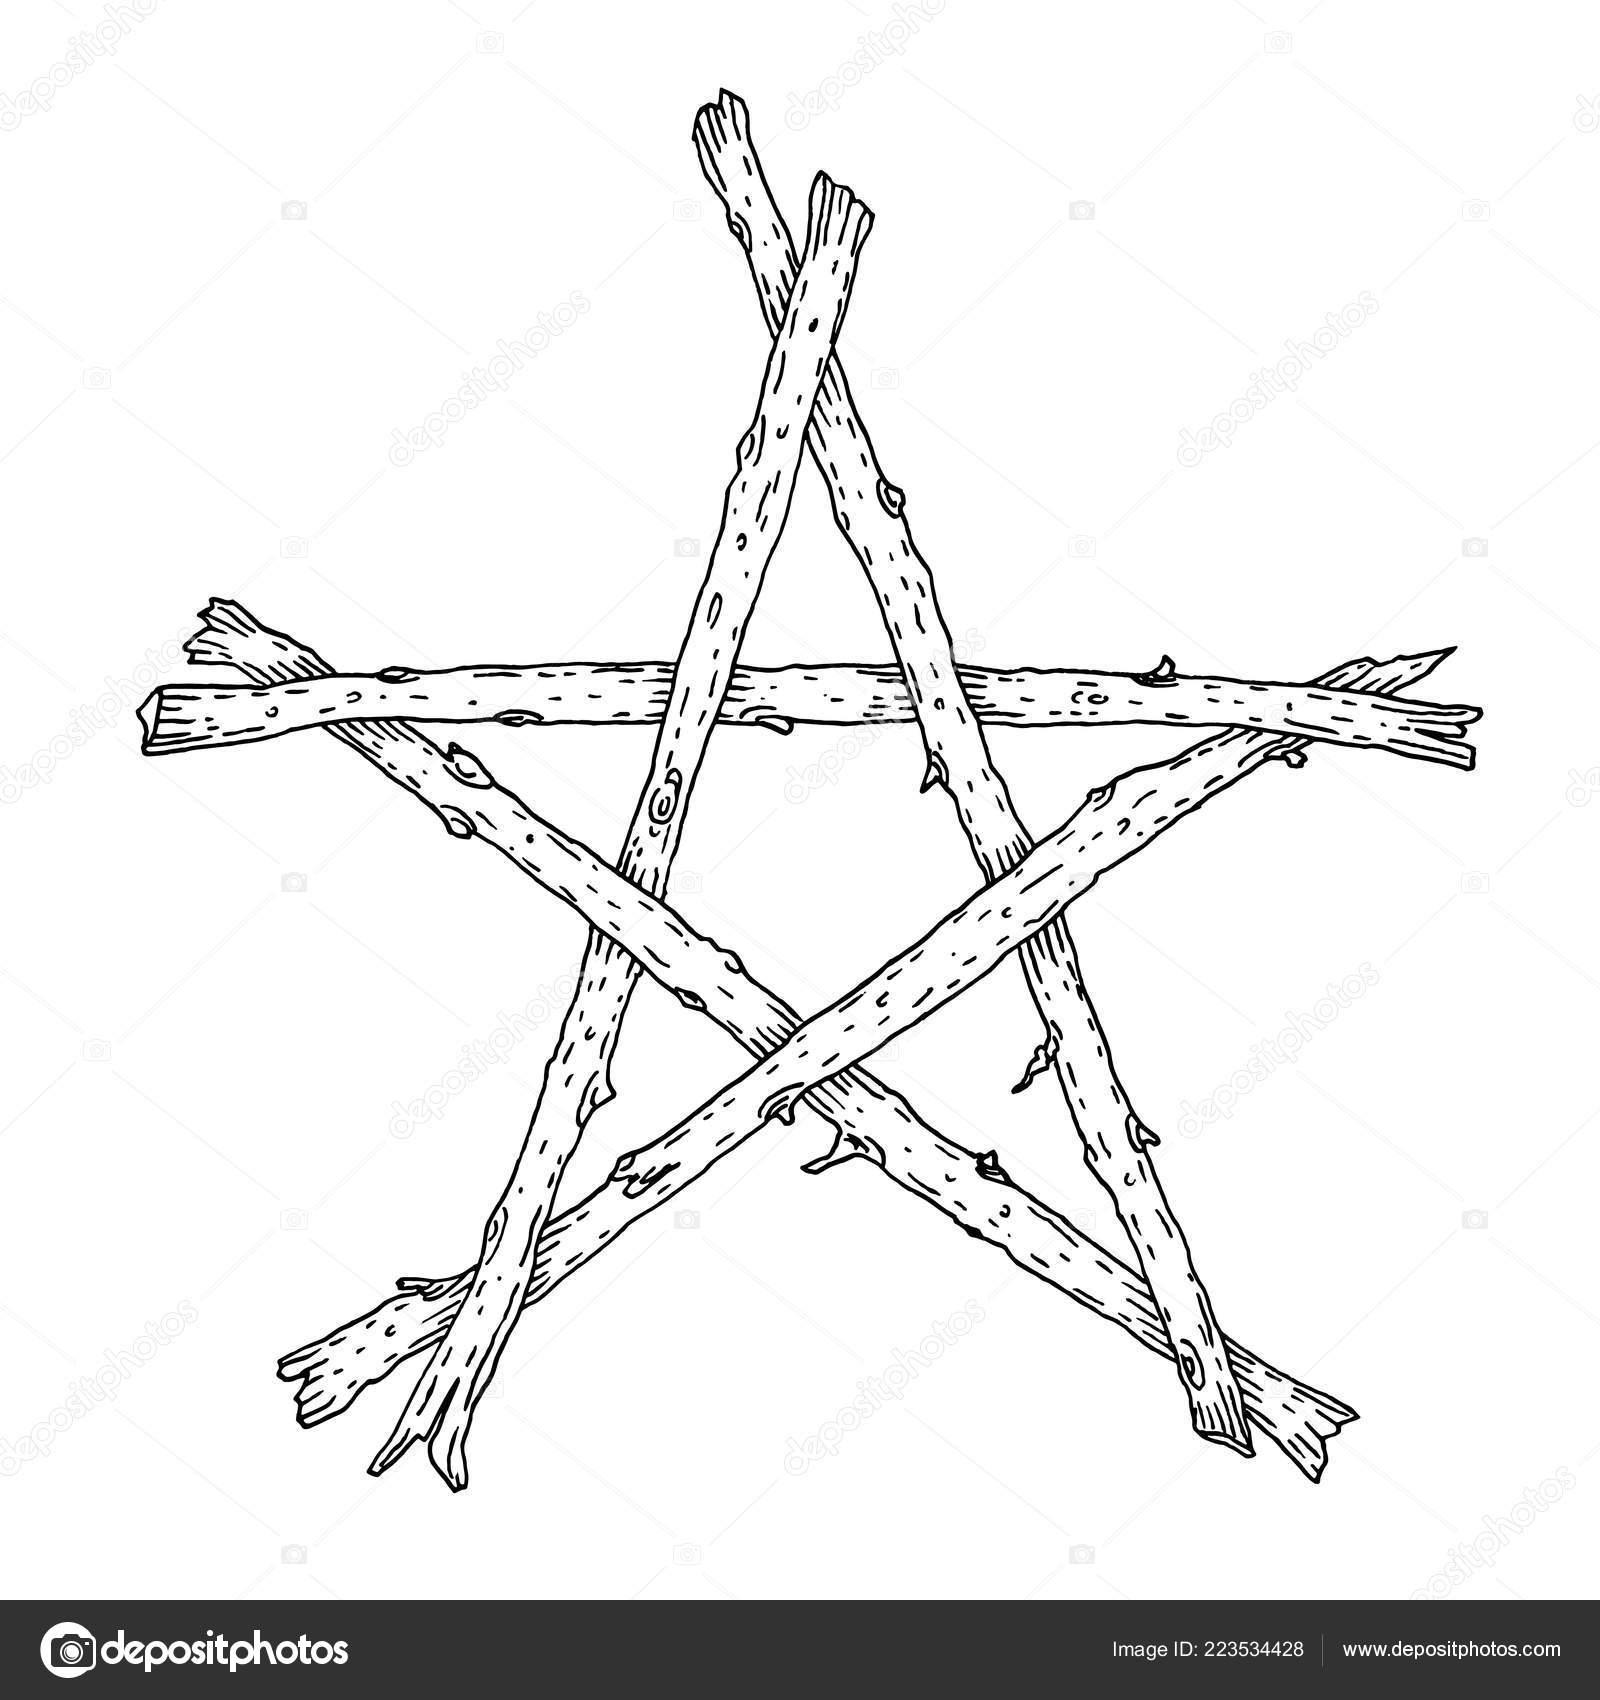 Hand Drawn Wooden Sticks Pentagram Icon Magic Occult Wicca Star